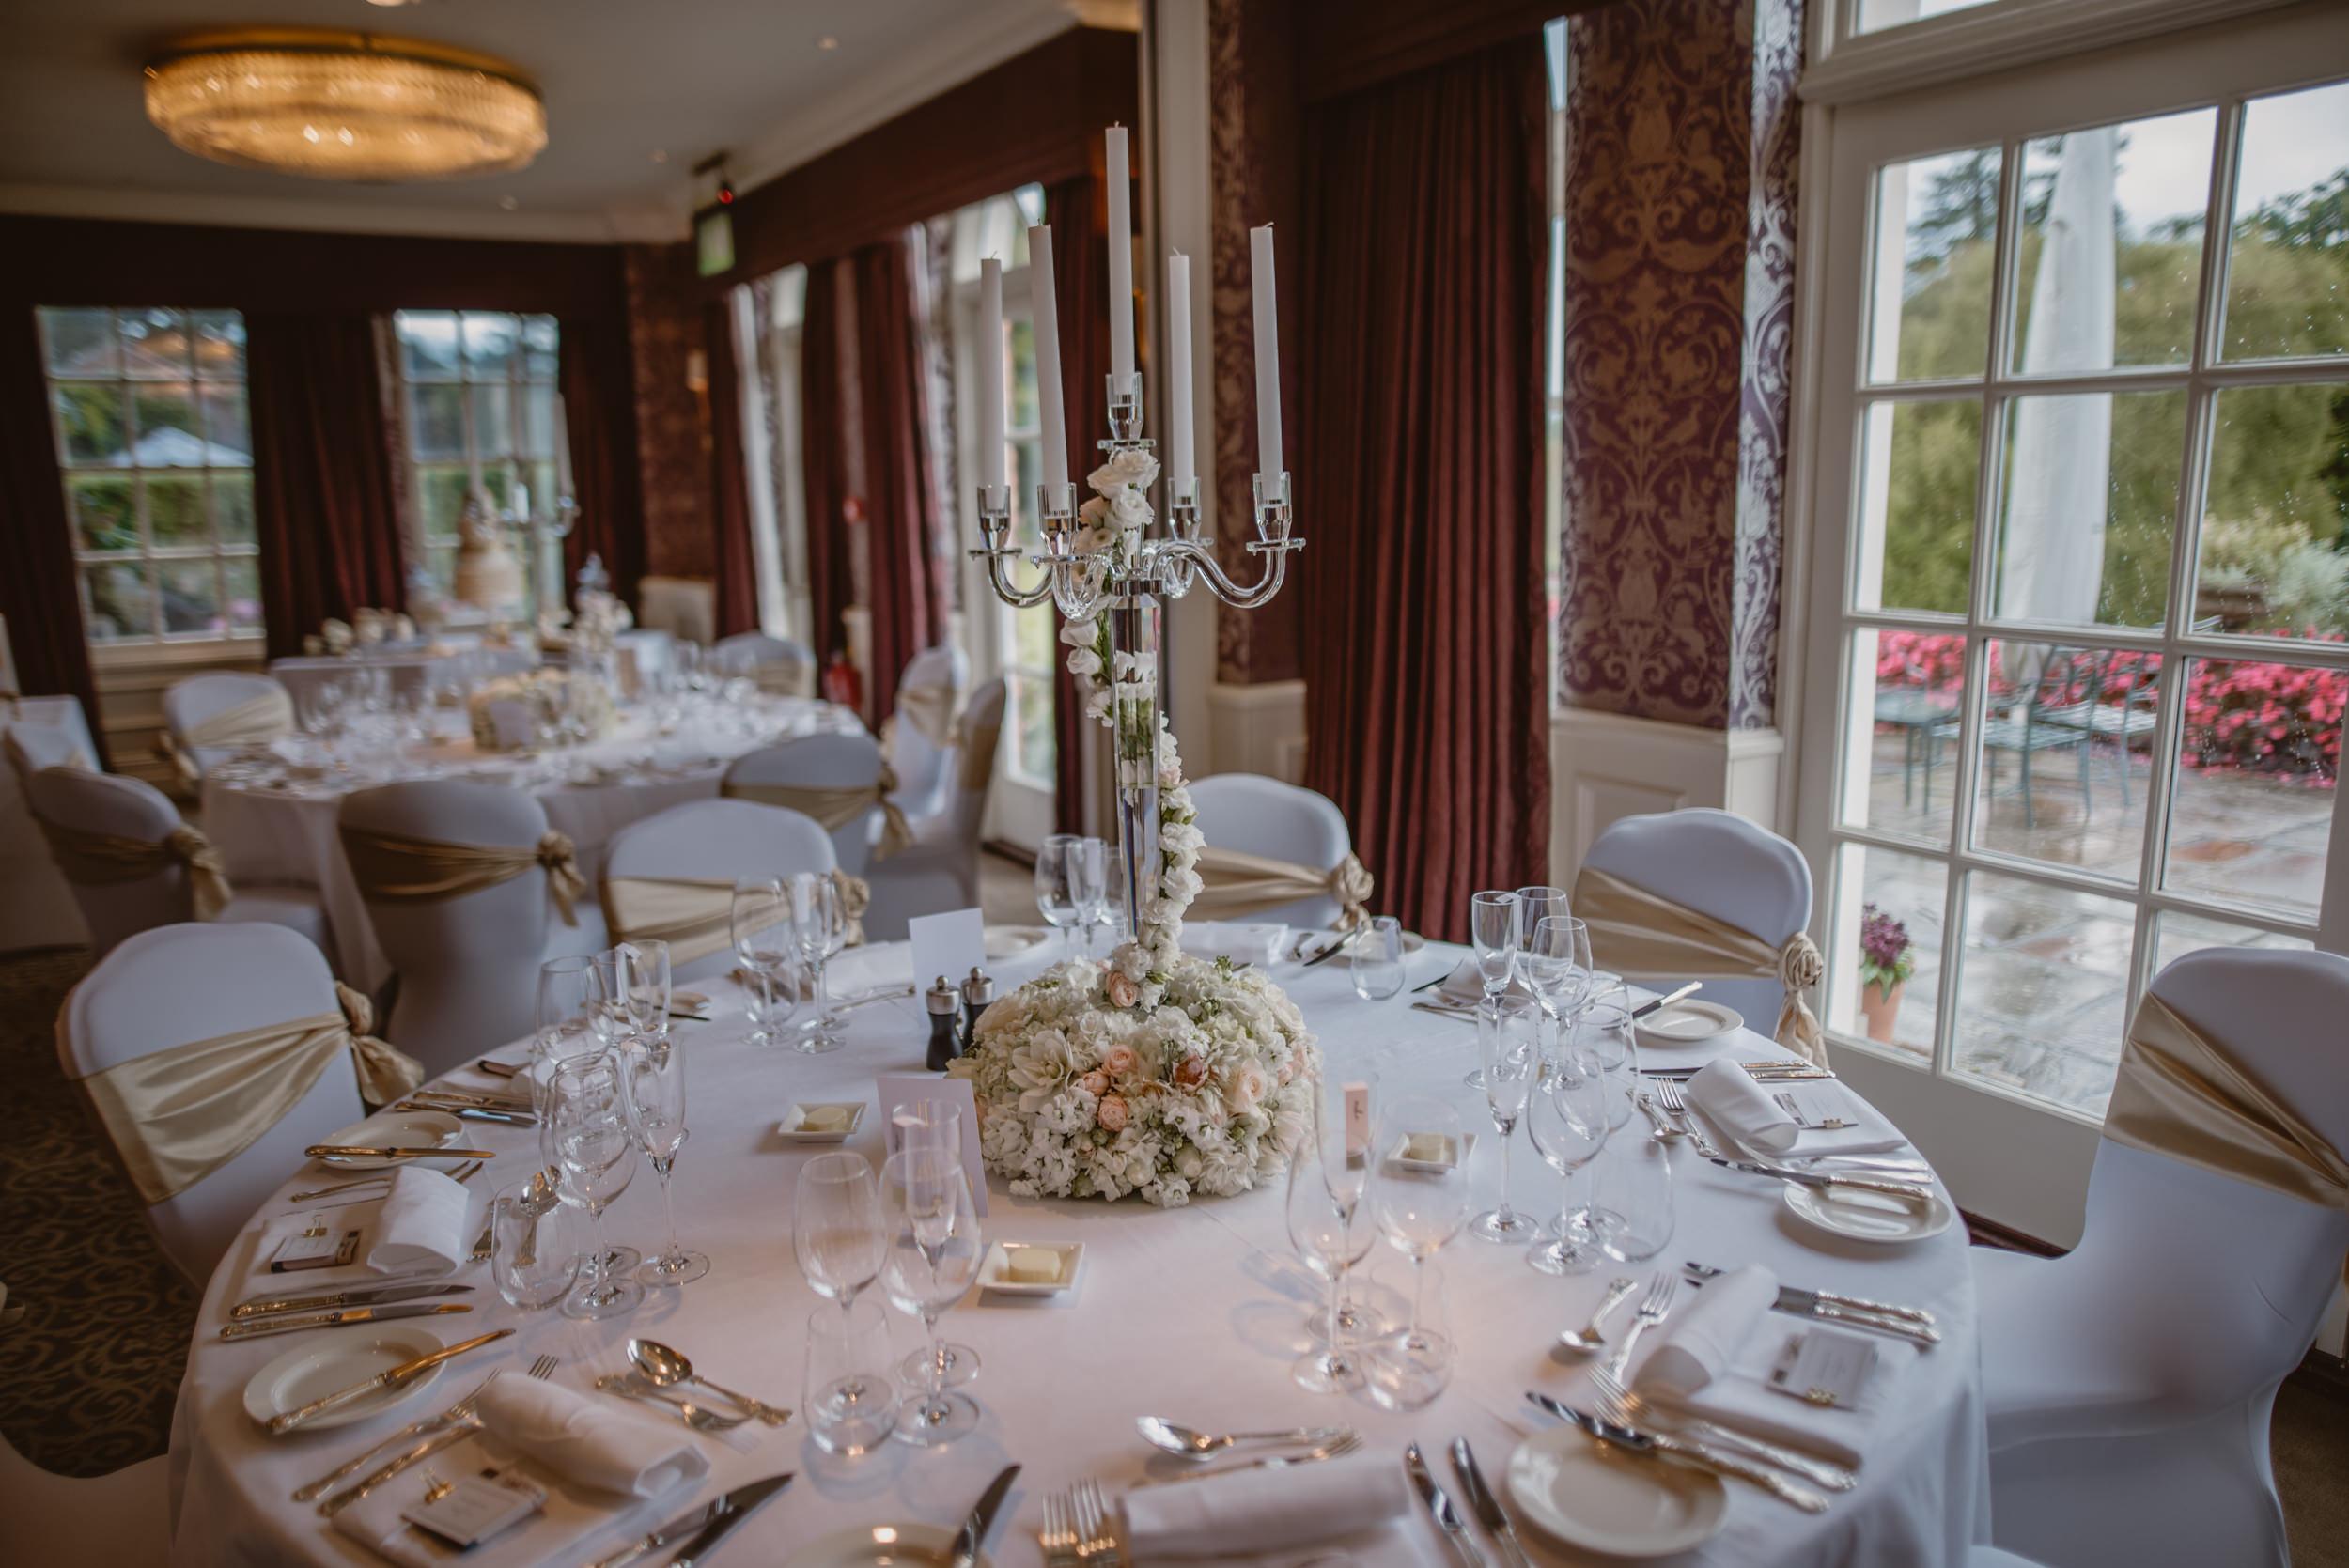 Trisha-and-Roger-wedding-The-Priory-Church-and-Chewton-Glen-Hotel-Christchurch-Manu-Mendoza-Wedding-Photography-248.jpg